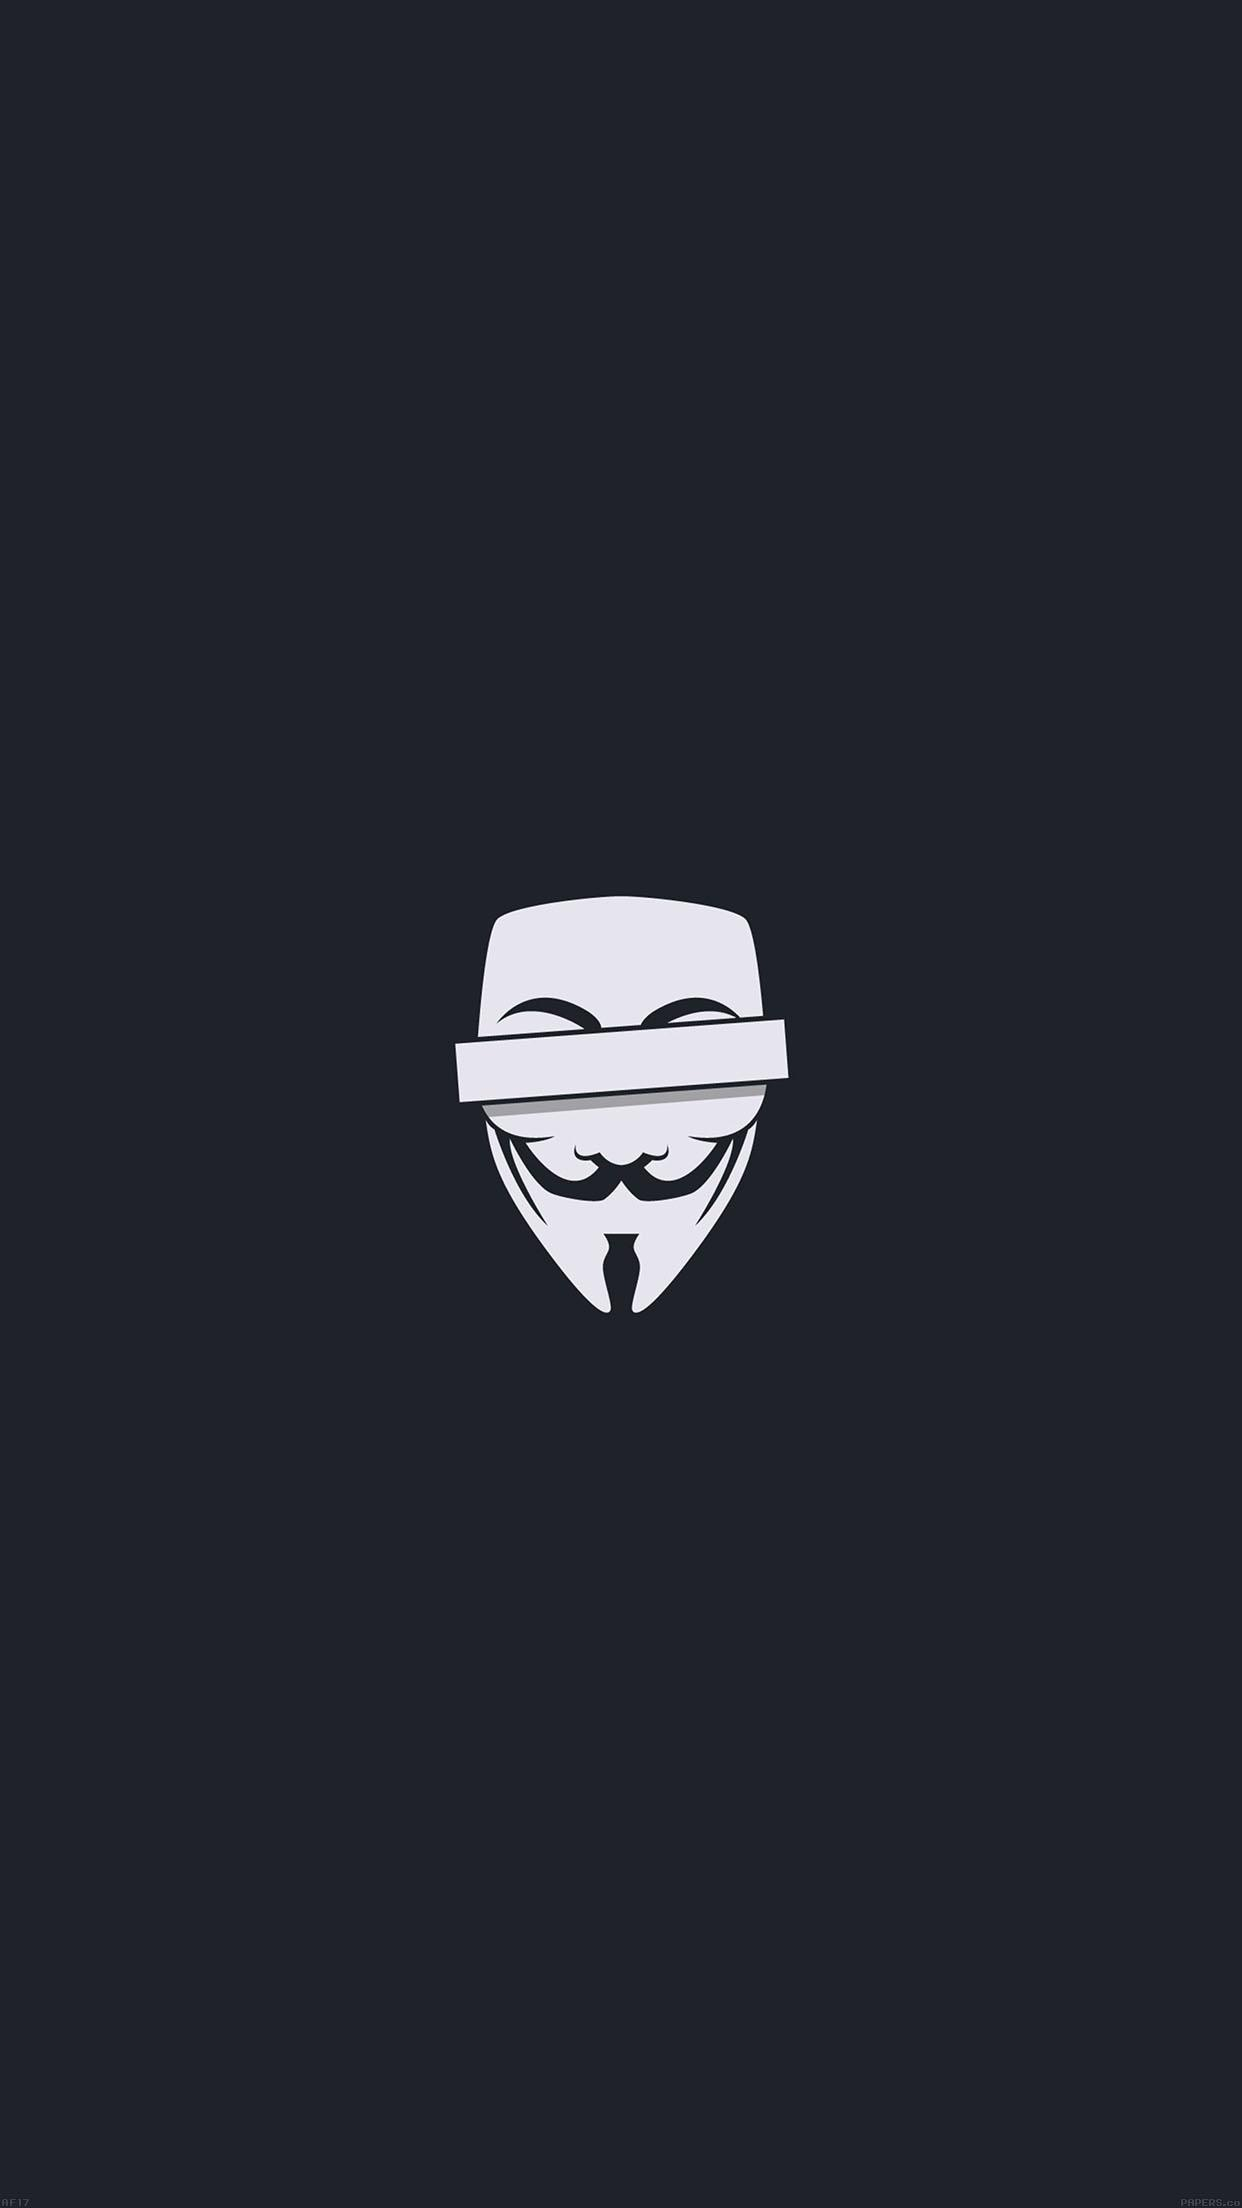 anonymous mask wallpaper image - photo #15